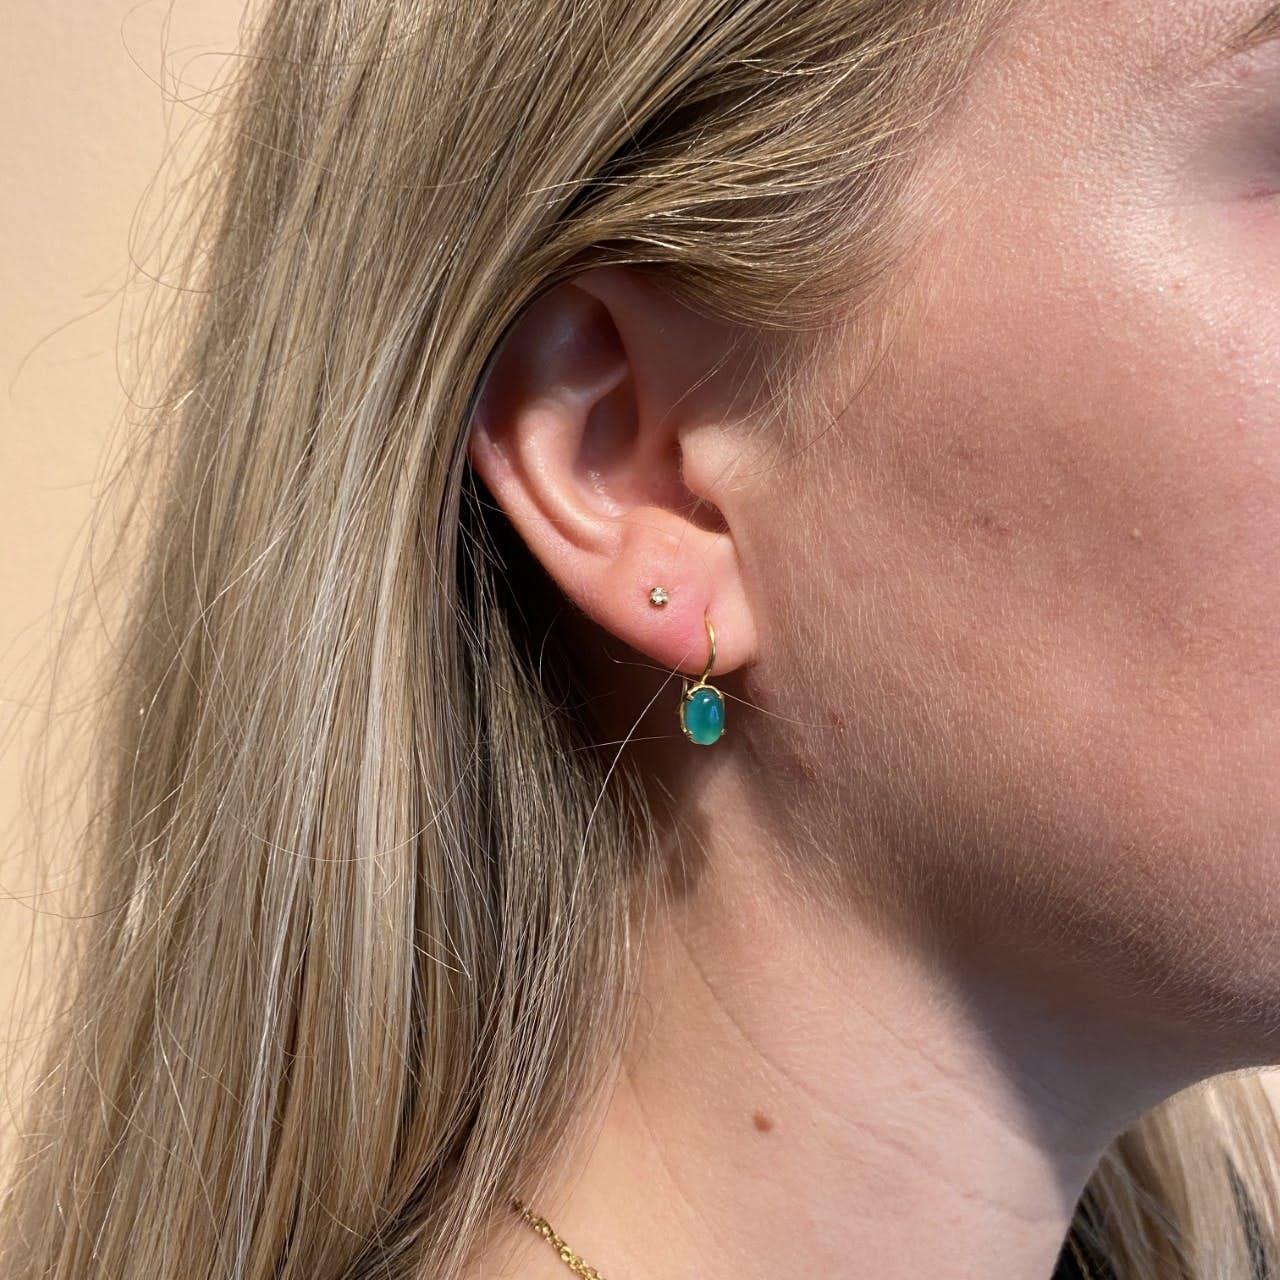 Gem Candy Earrings Confidence von Carré in Vergoldet-Silber Sterling 925|